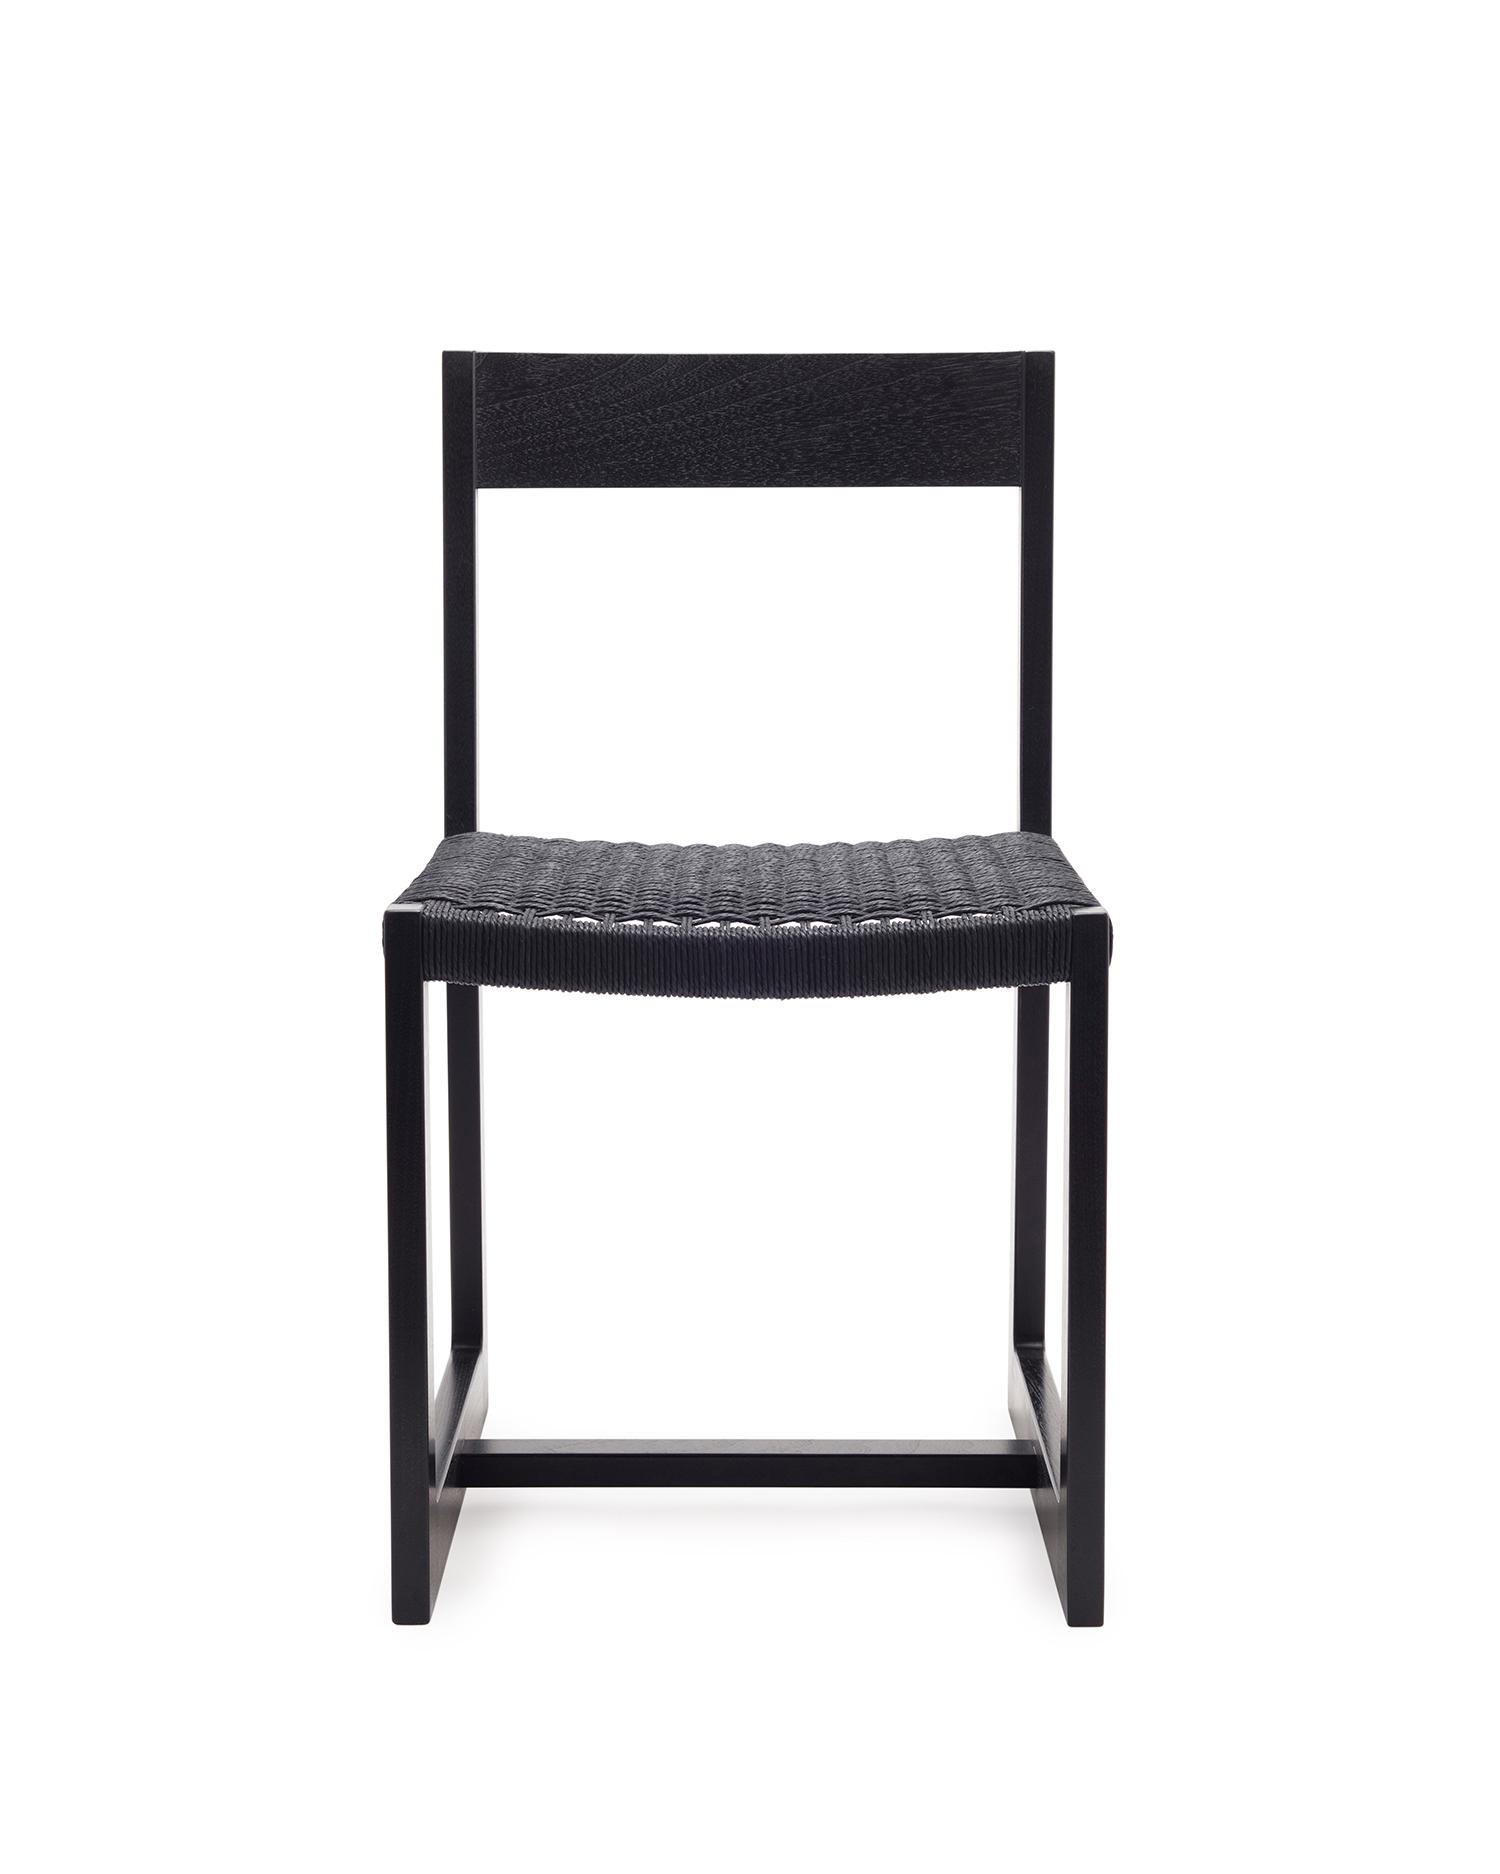 Matteawan dining chair in ebonized walnut and black Danish cord